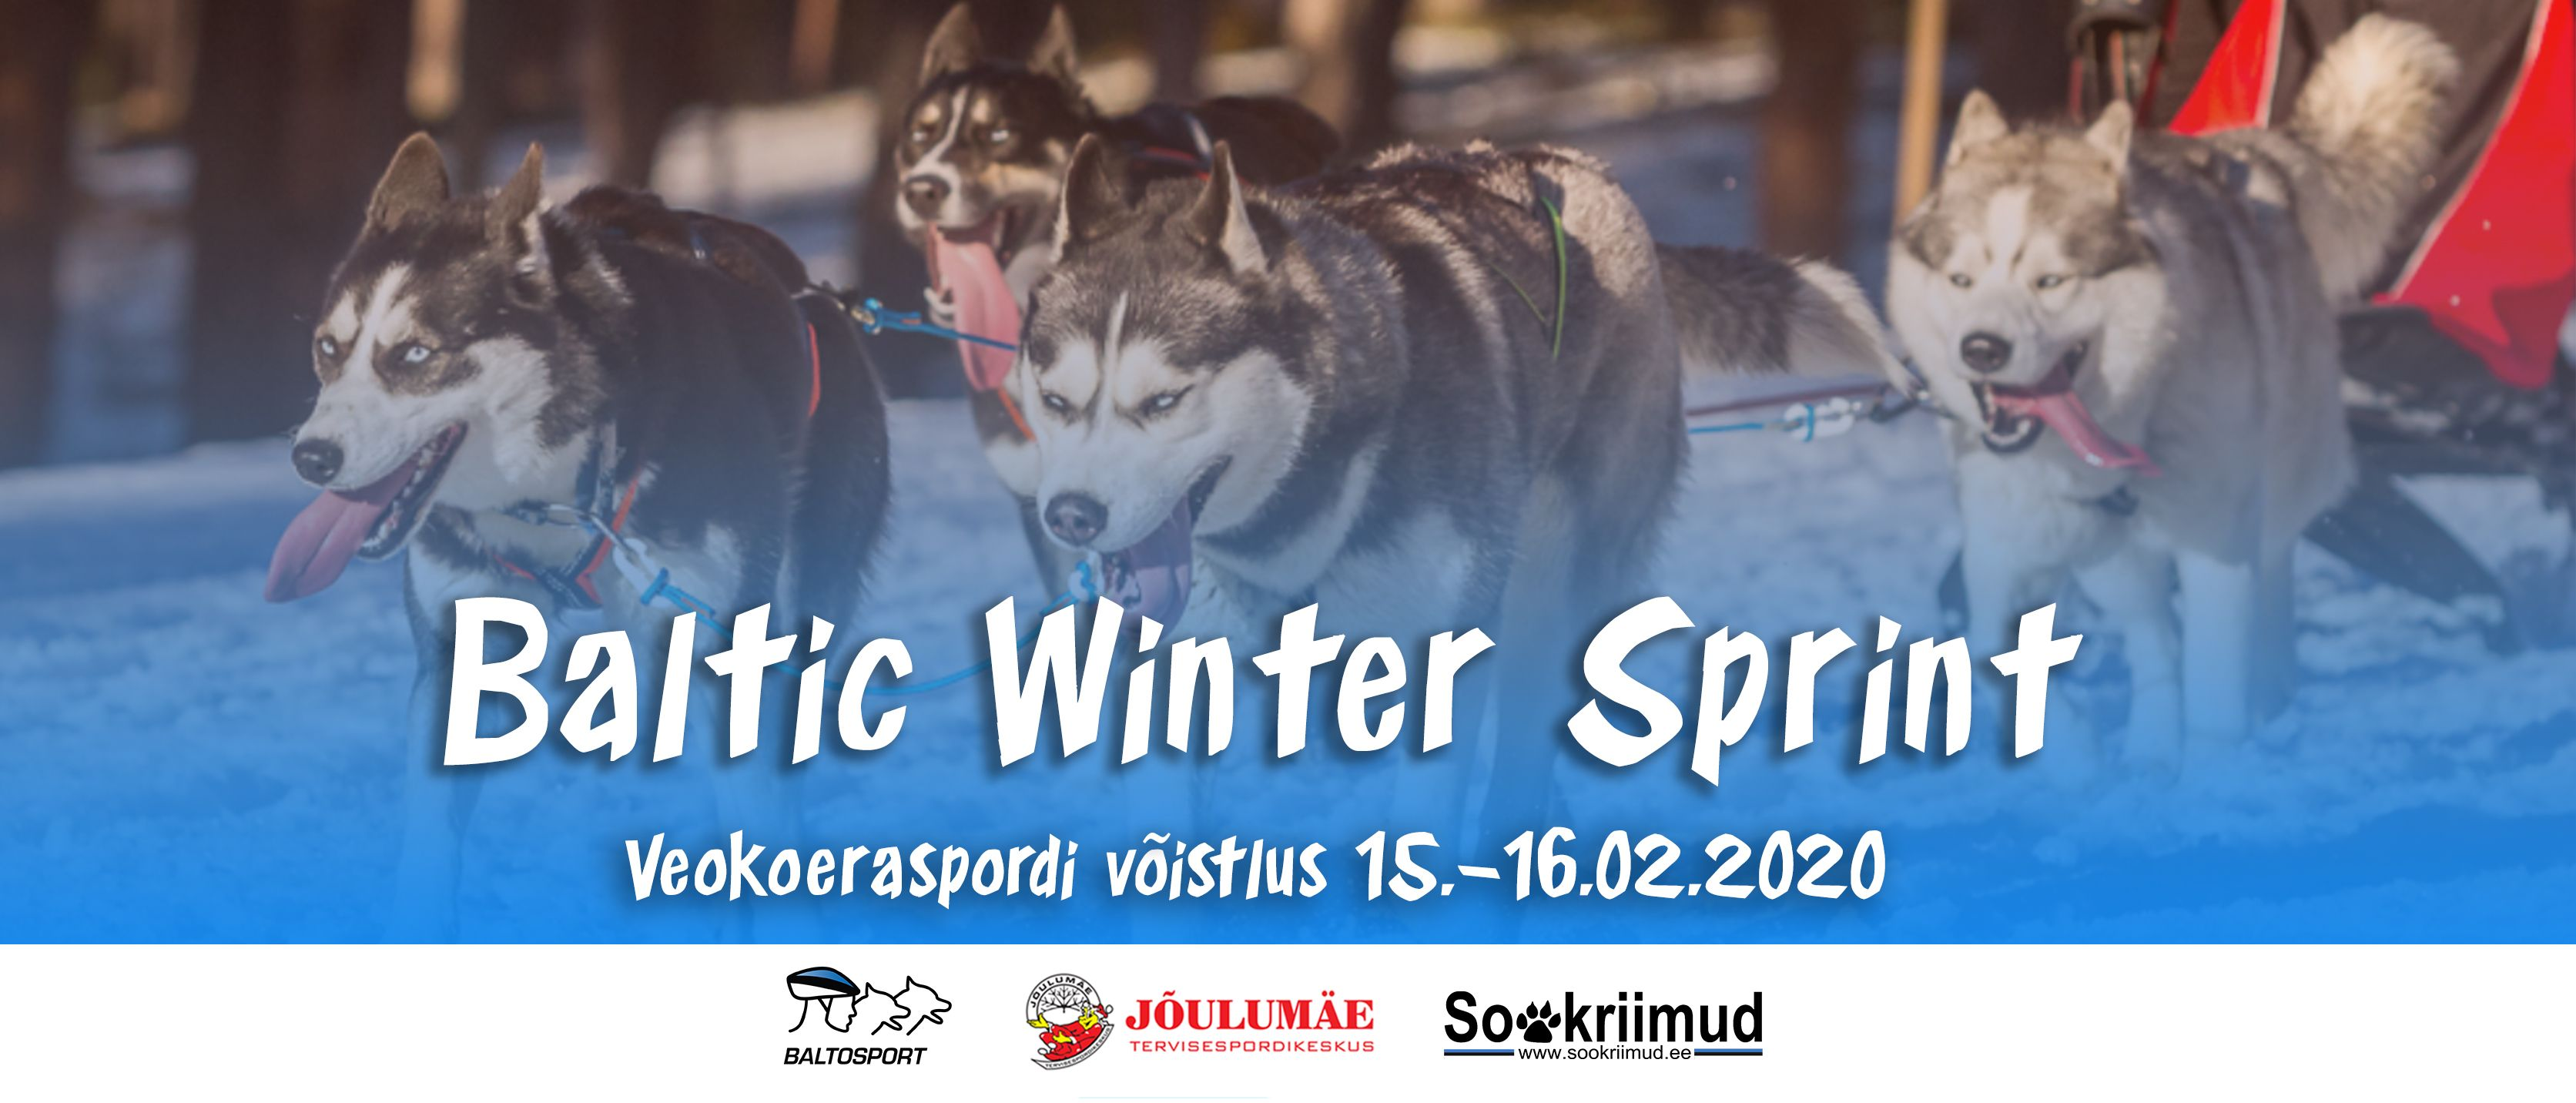 Baltic Winter Sprint 2020 veokoeraspordi võistlus Jõulumäel